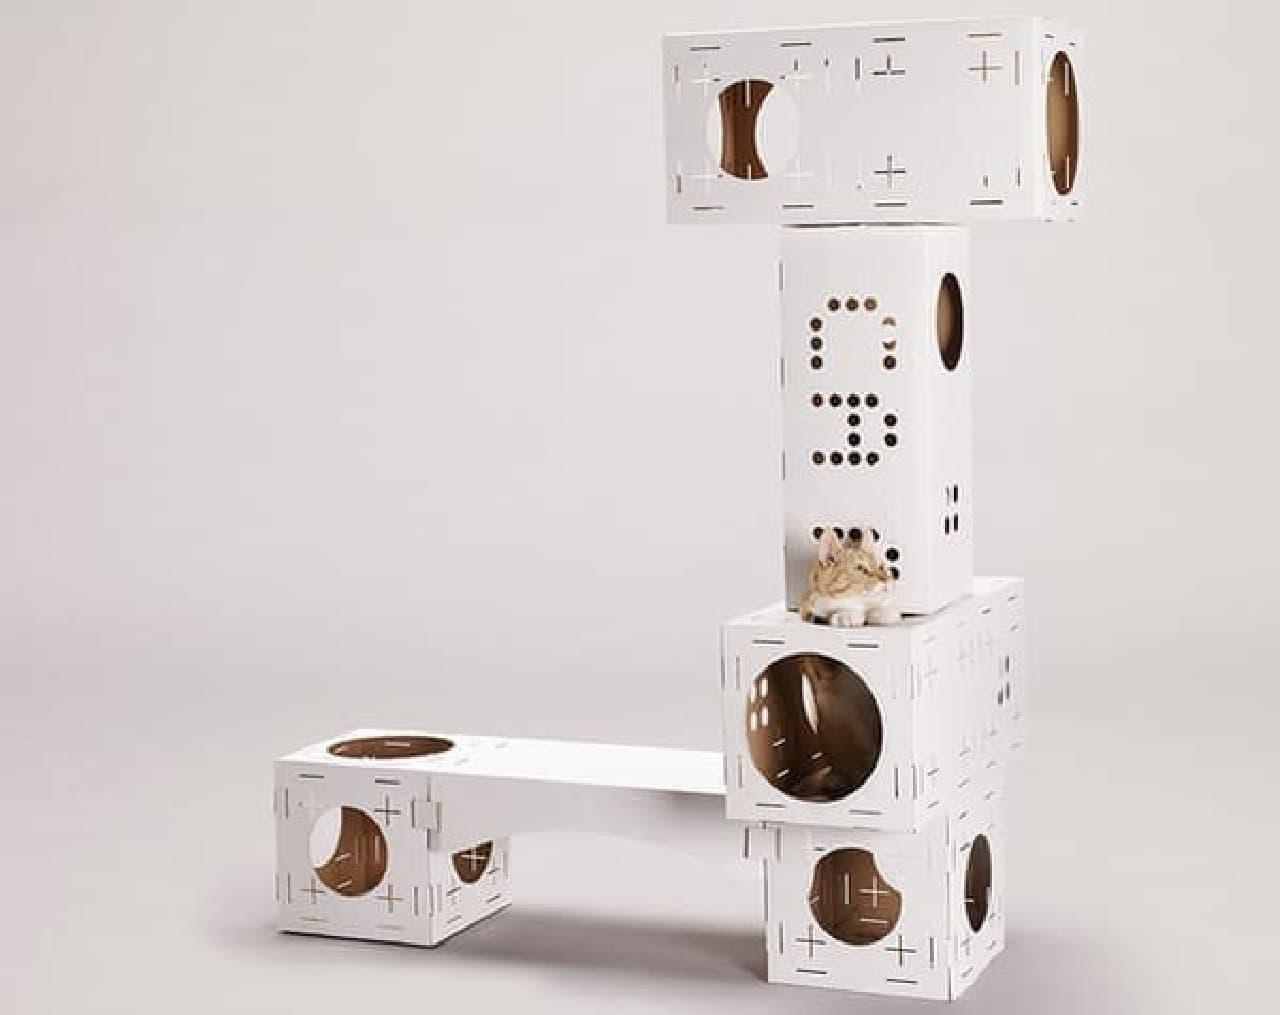 「BLOCKS」による標準的なキャットタワー